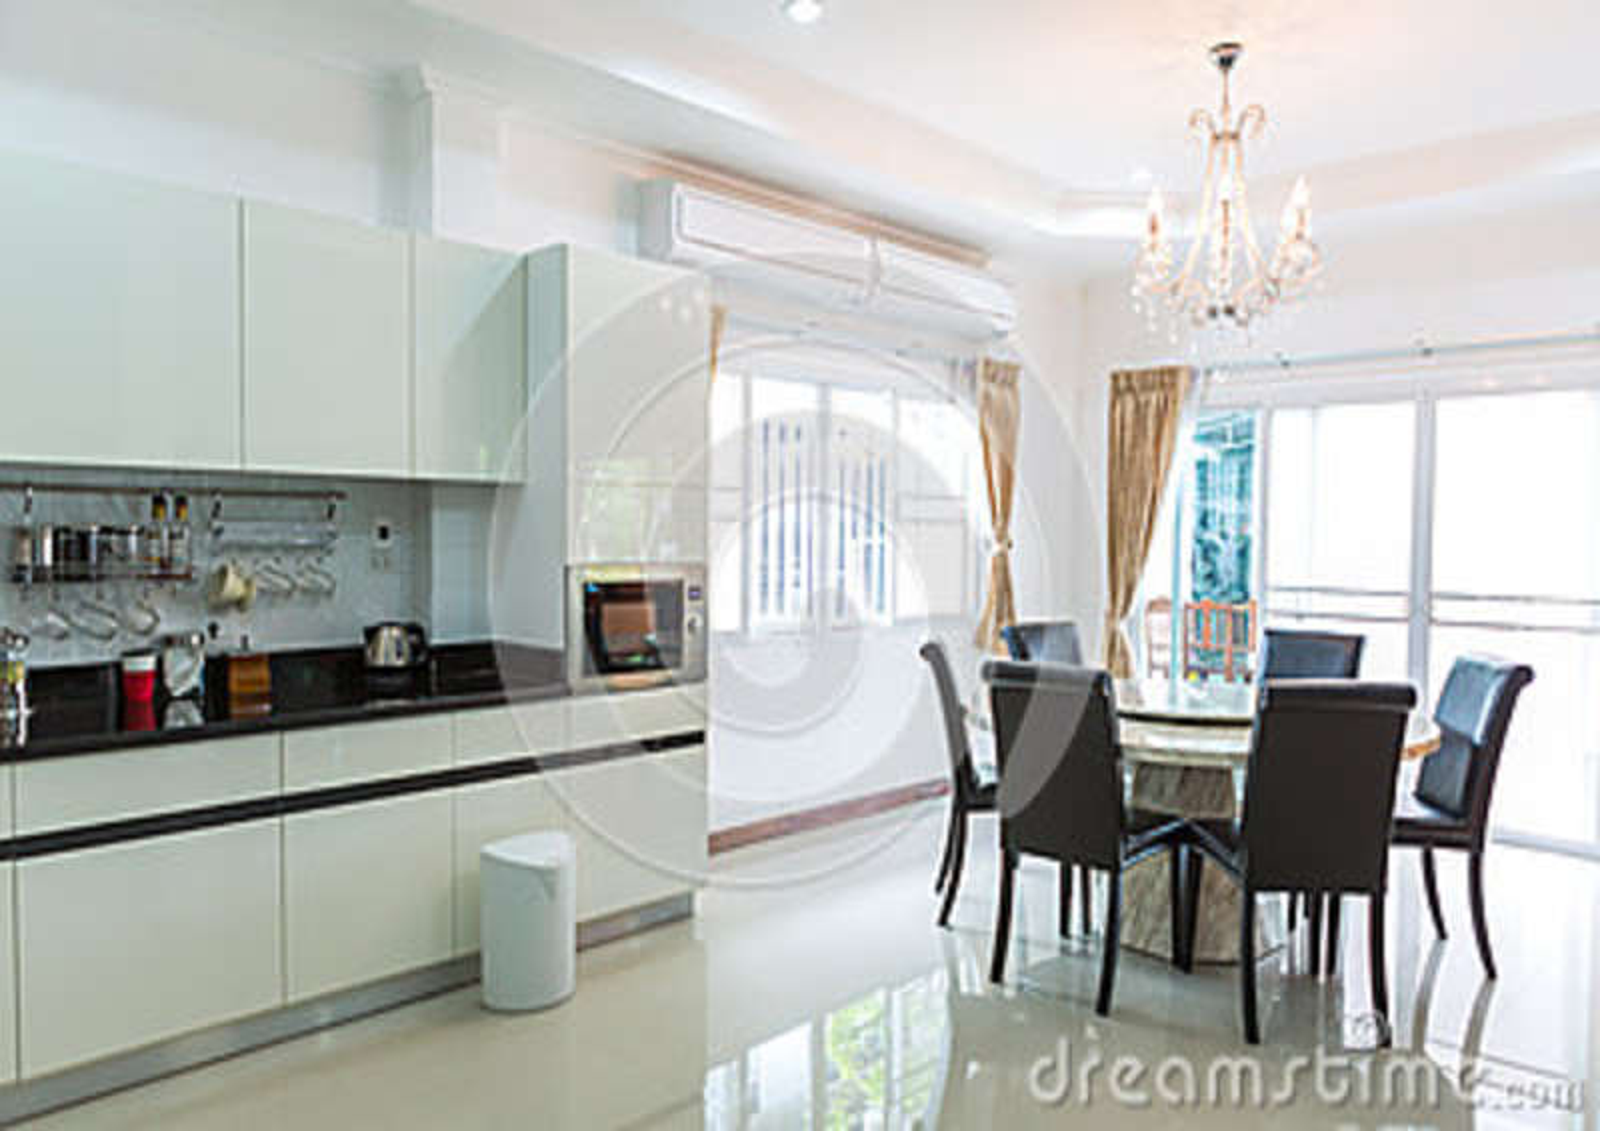 kitchen cabinet makers sinks & faucets 有咖啡角落的厨柜在现代家庭客厅库存照片 图片包括有制造商 计数器 出 有咖啡角落的厨柜在现代家庭客厅